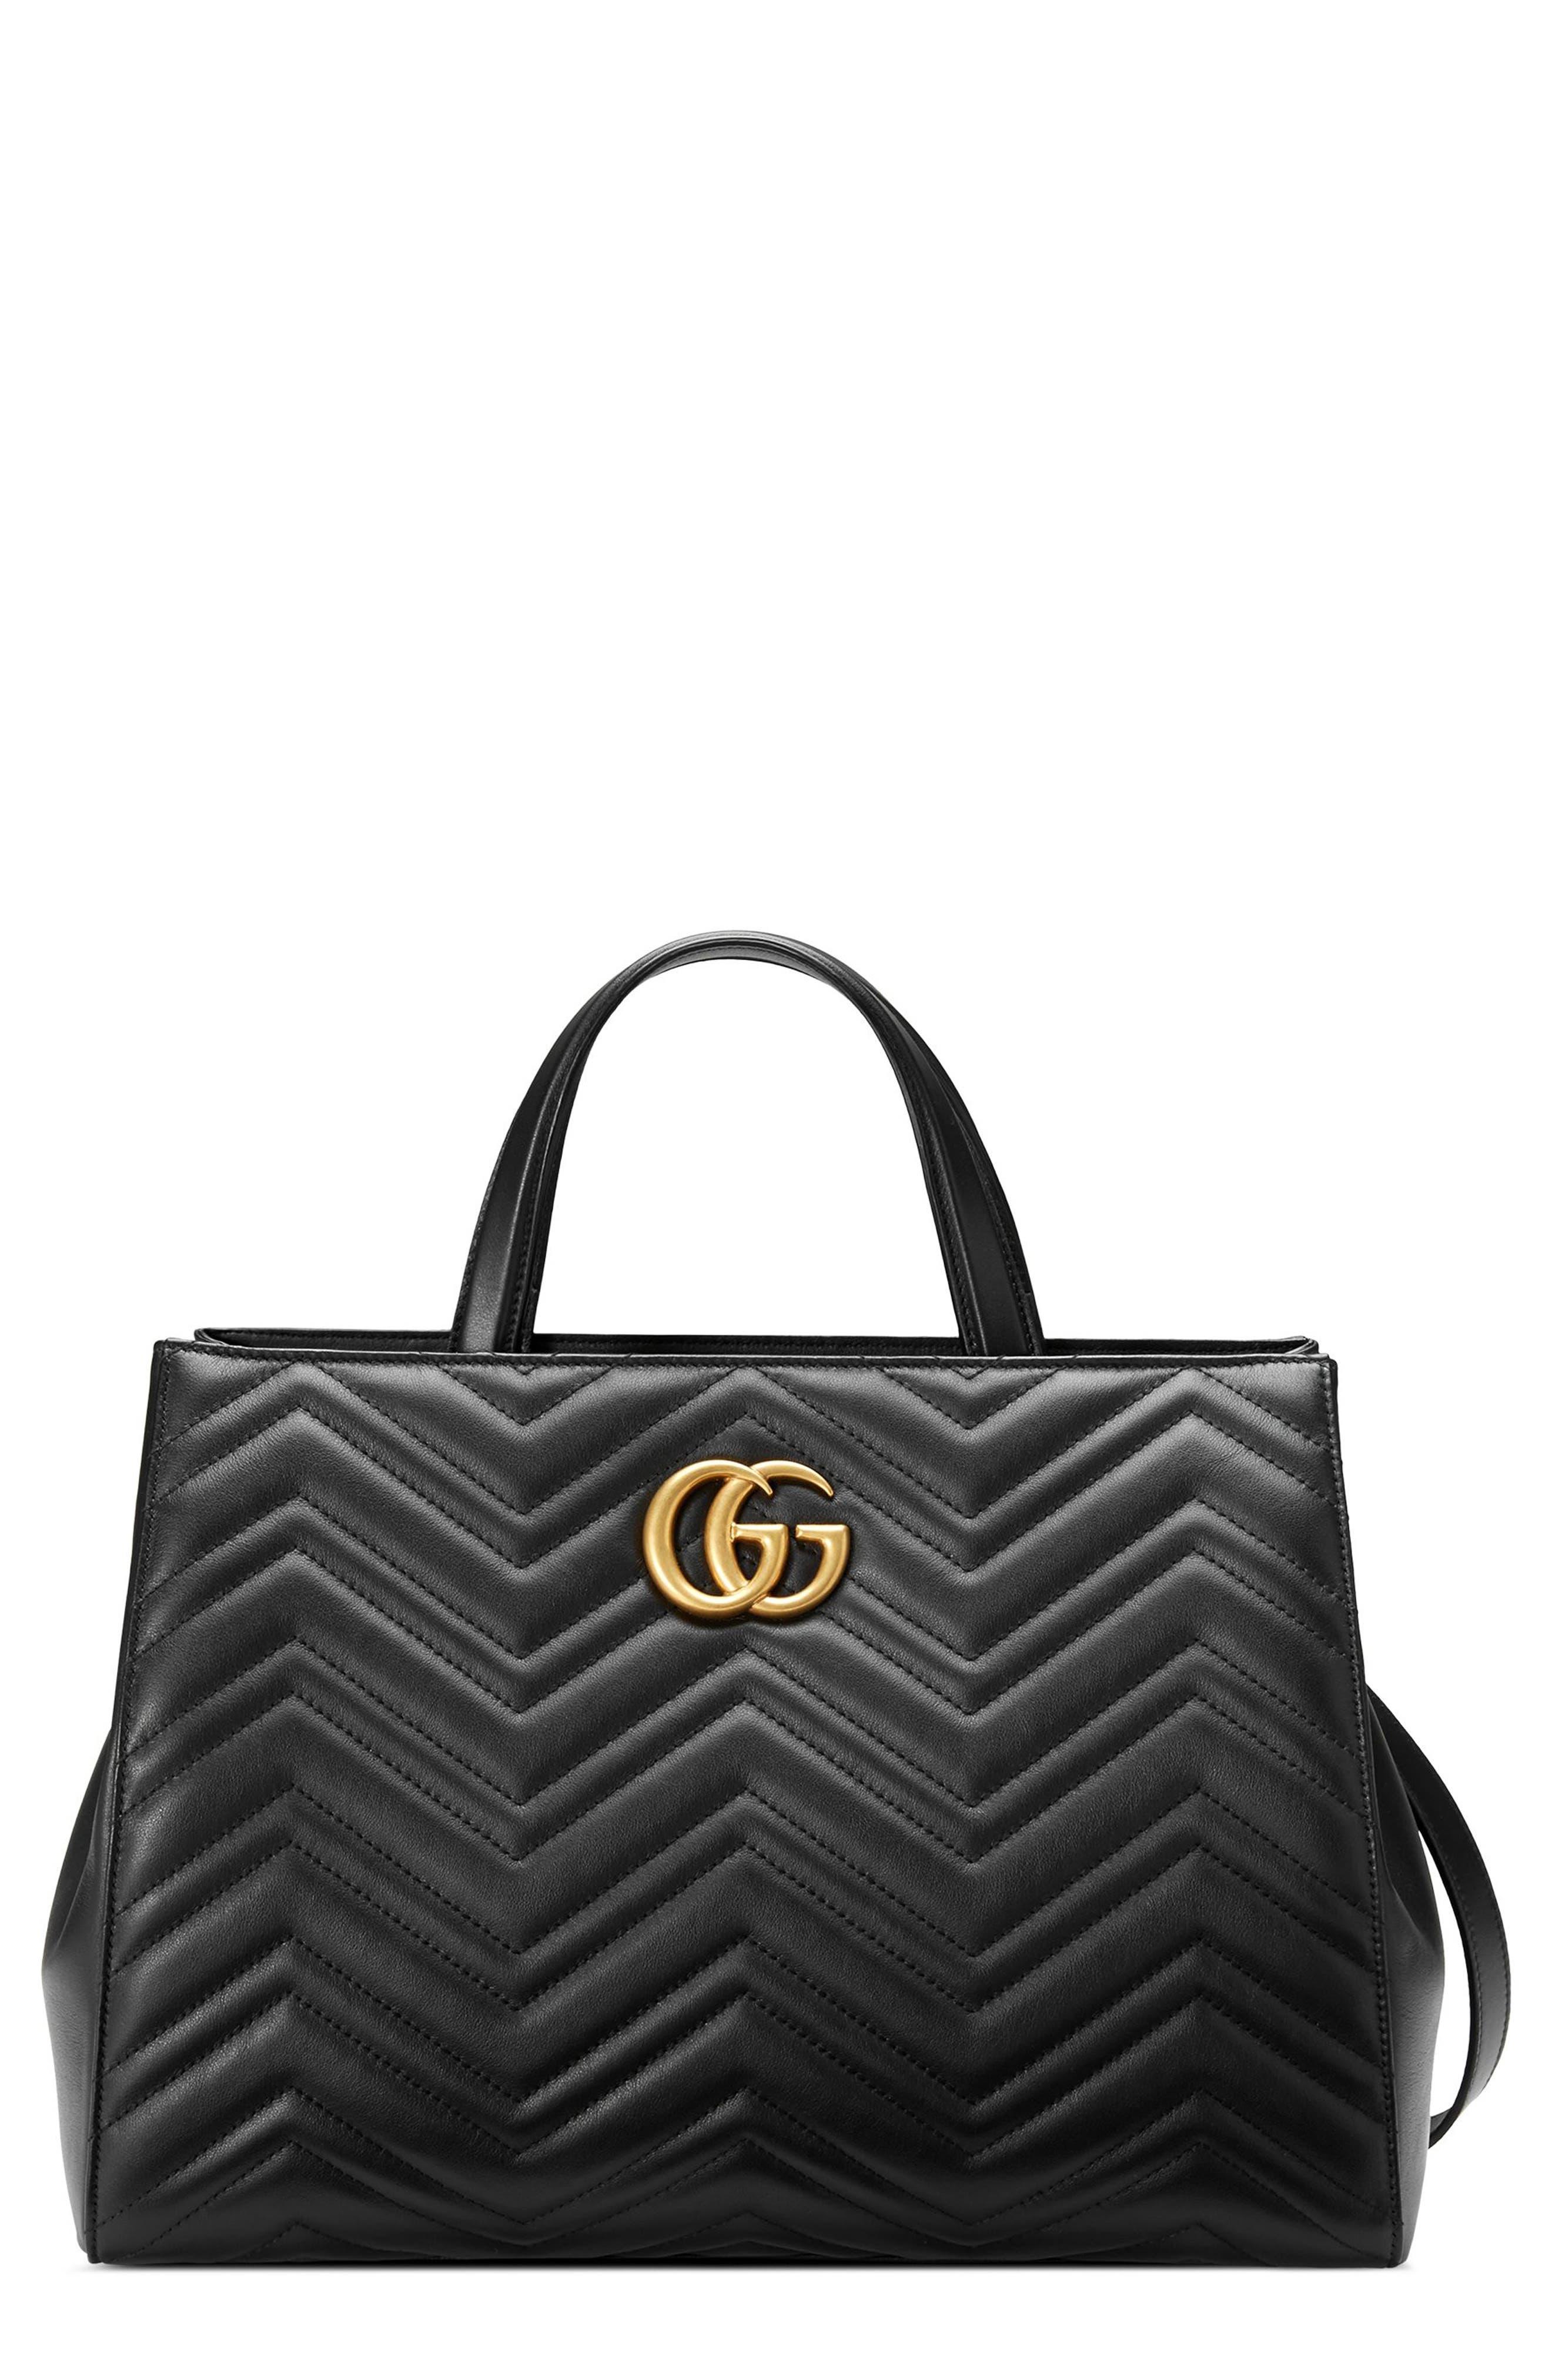 Alternate Image 1 Selected - Gucci GG Marmont Medium Matelassé Leather Top Handle Shoulder Bag